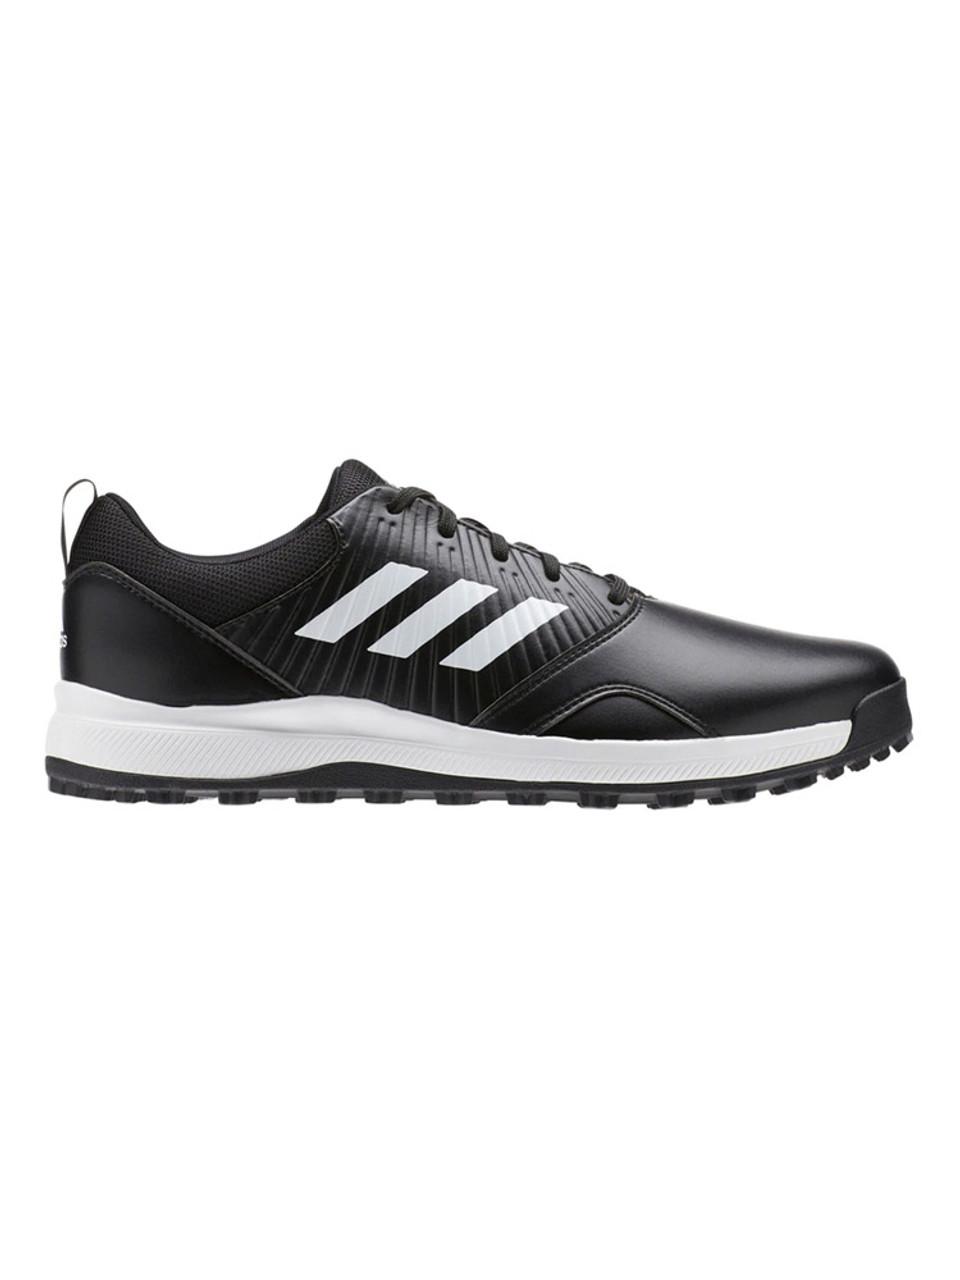 ccf516625e07 Adidas CP Traxion SL Golf Shoes - Core Black FTWR White - Mens For ...